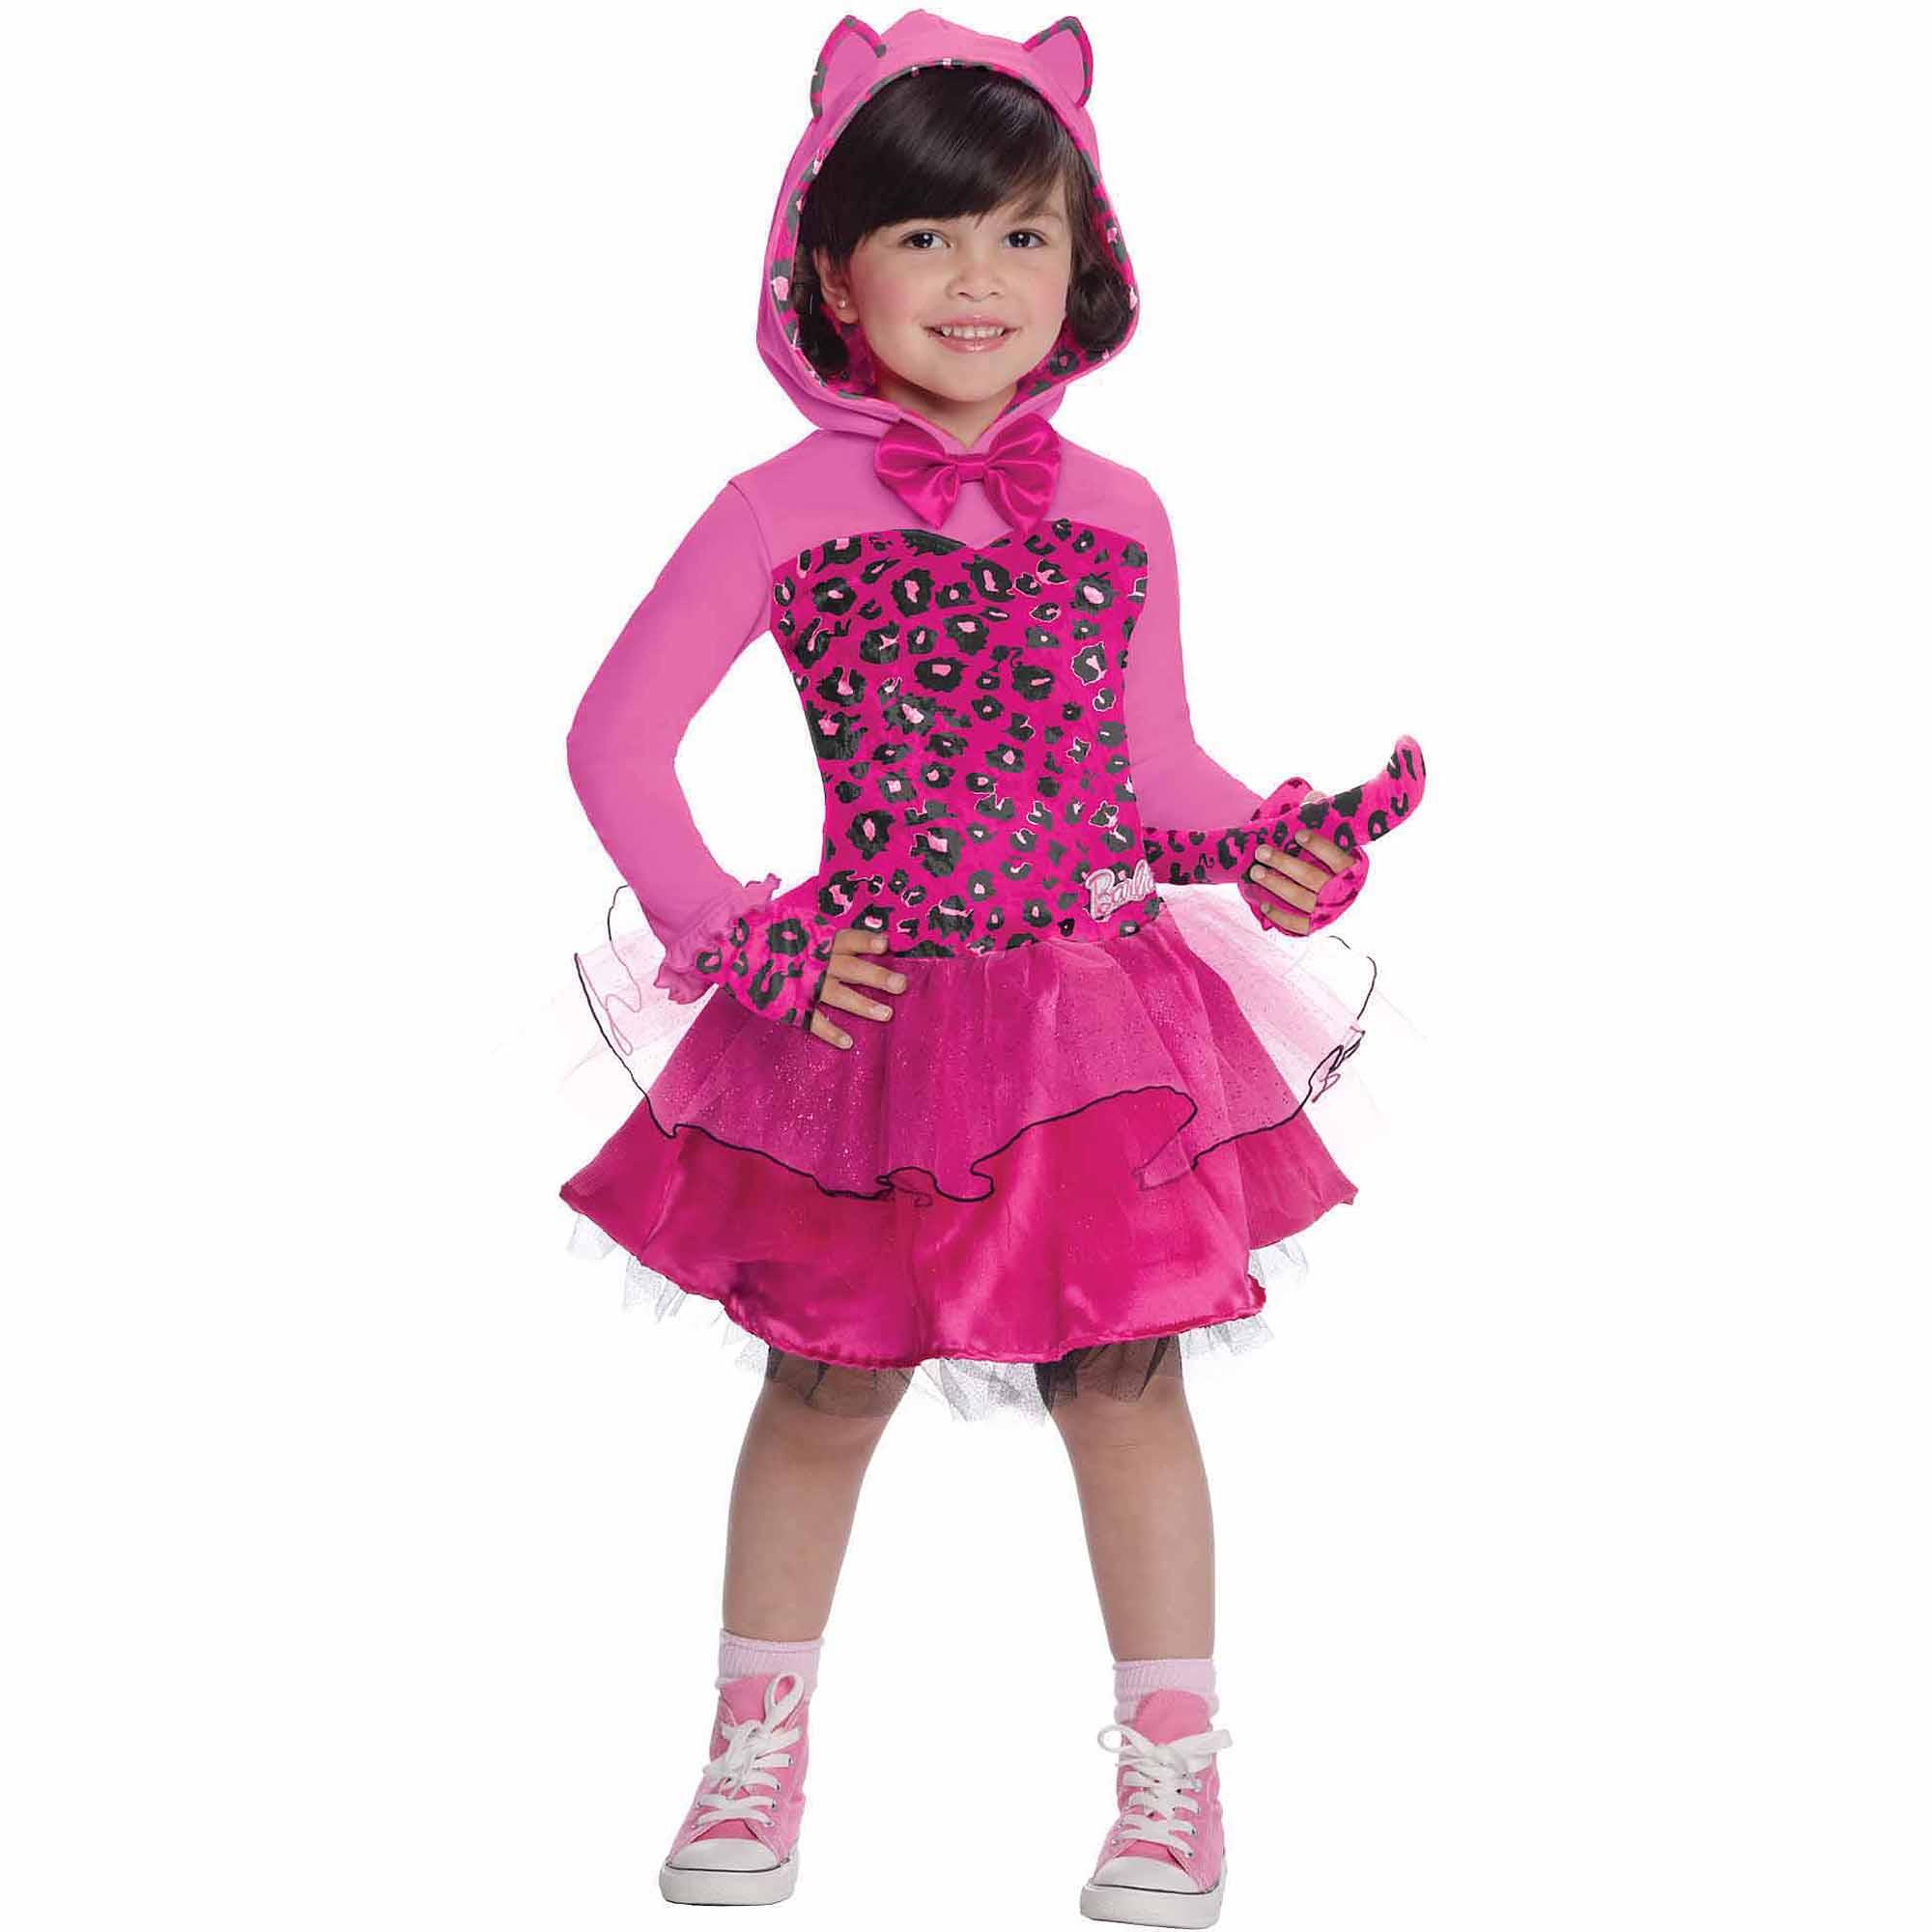 Barbie Kitty Child Halloween Costume - Walmart.com